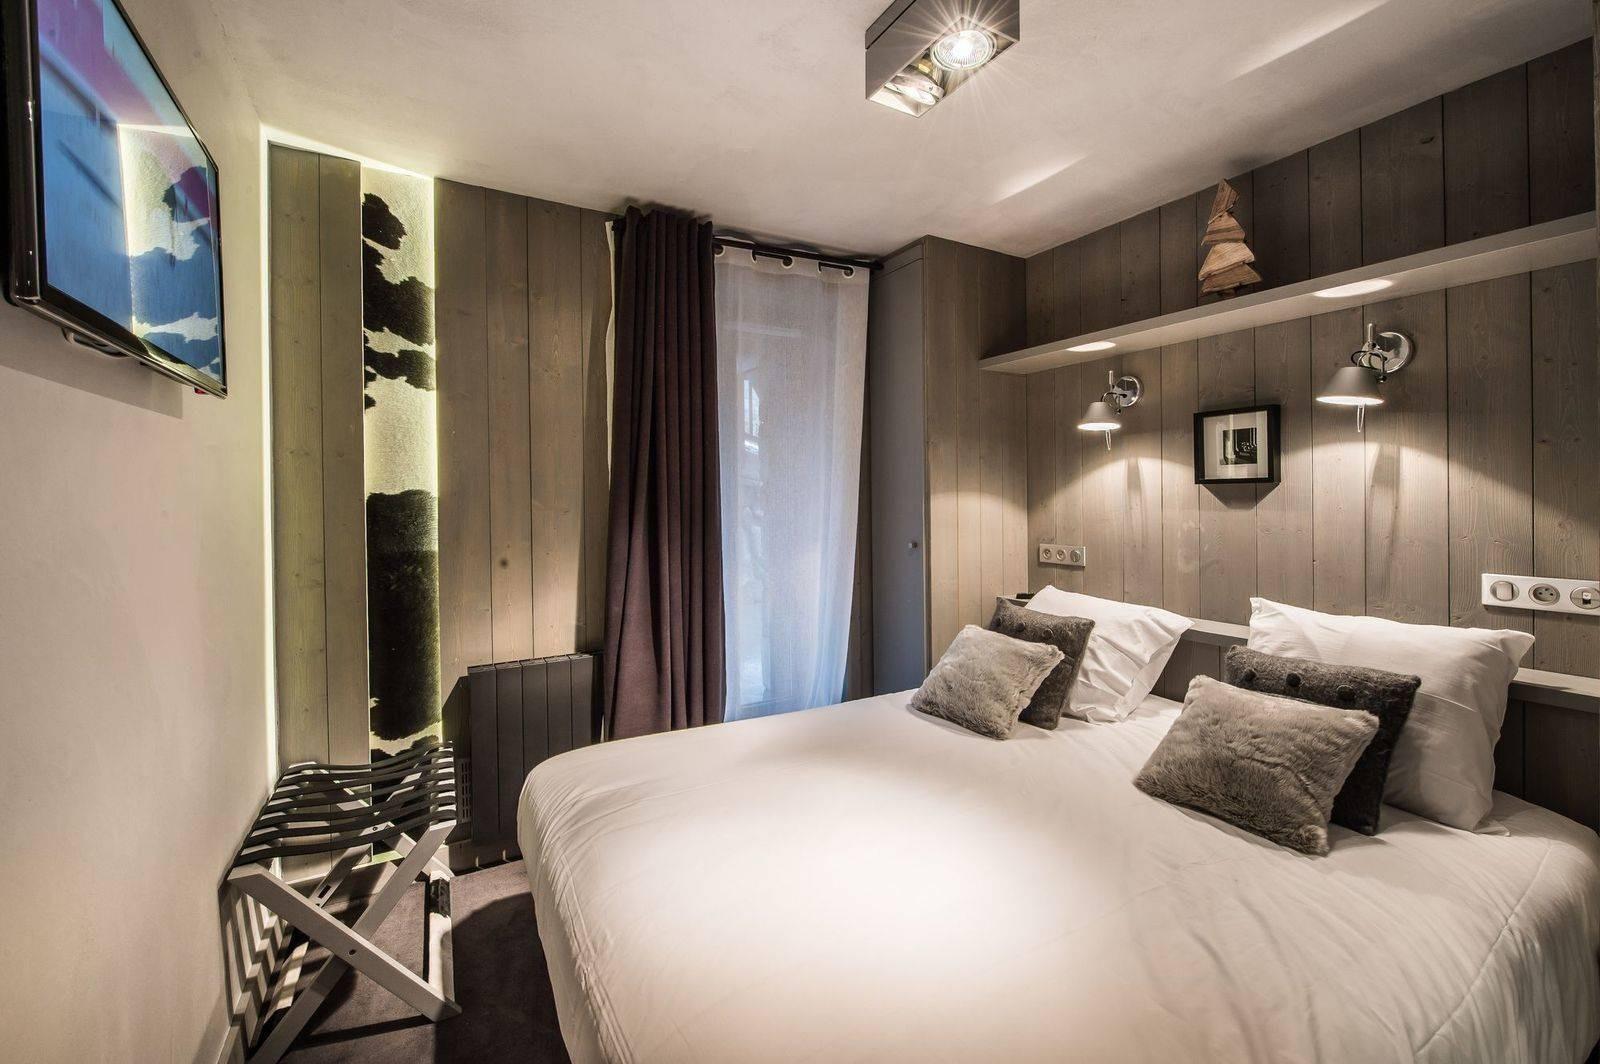 Courchevel 1650 Location Appartement Luxe Dalersi Chambre 3